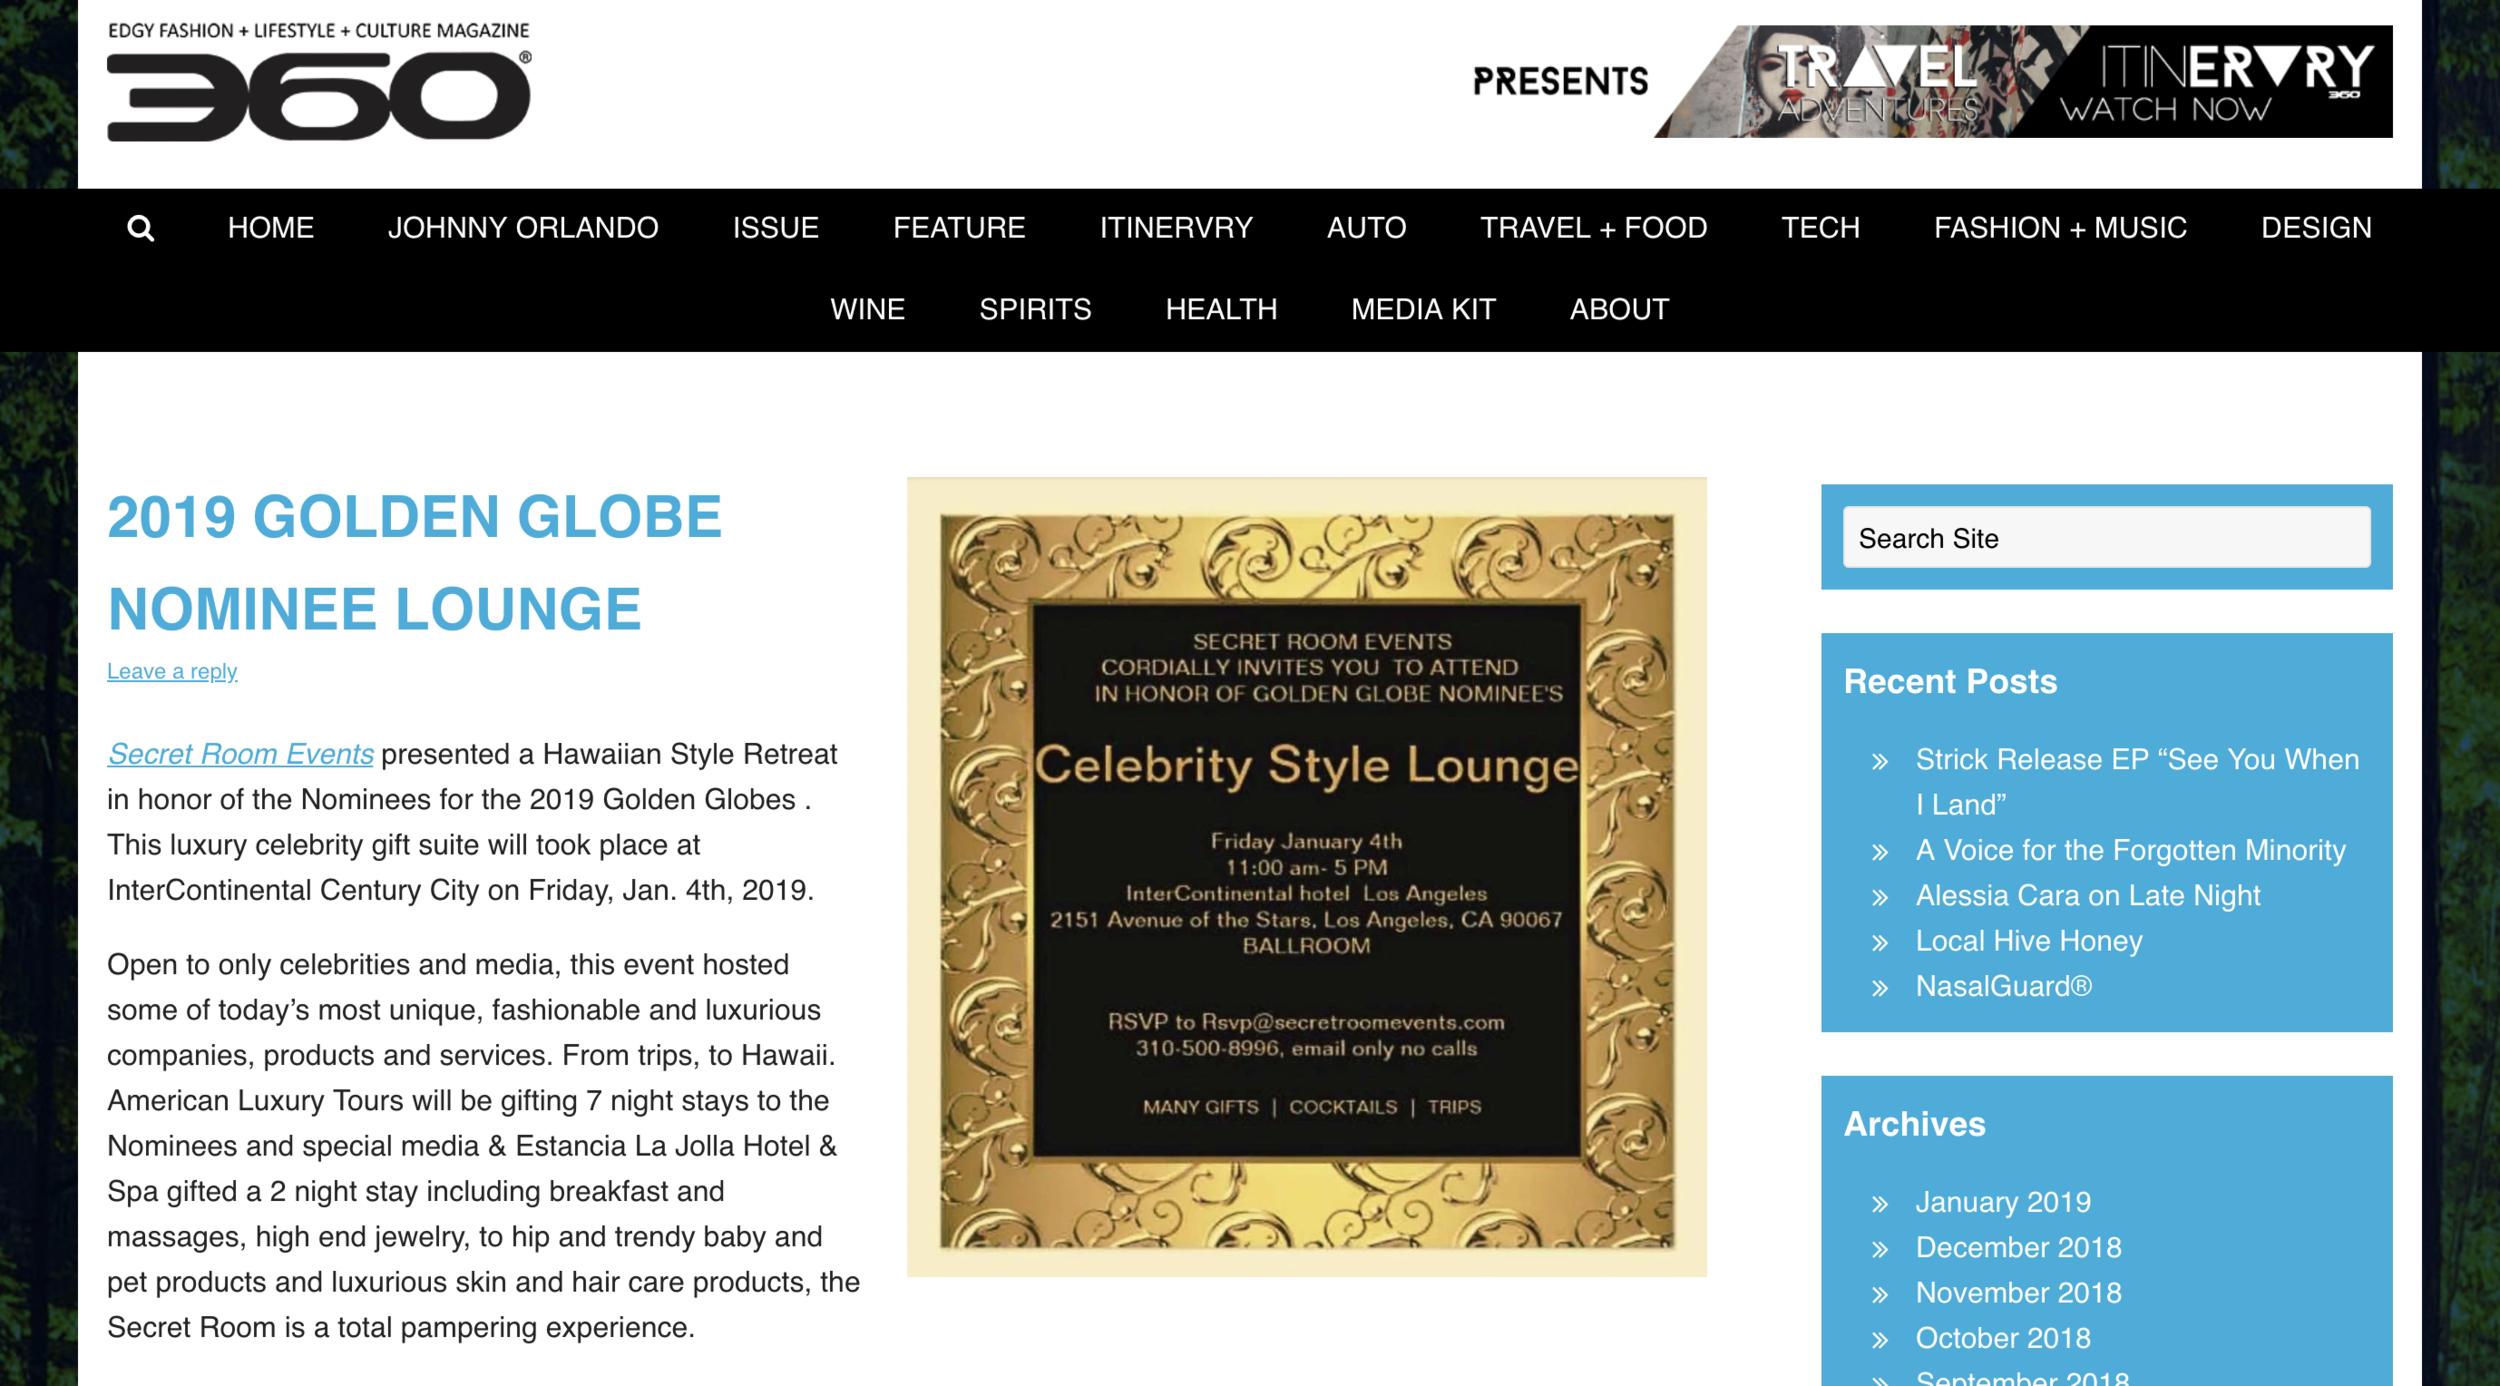 Edgy Fashion + Lifestyle + Culture Magazine - The Golden Globes